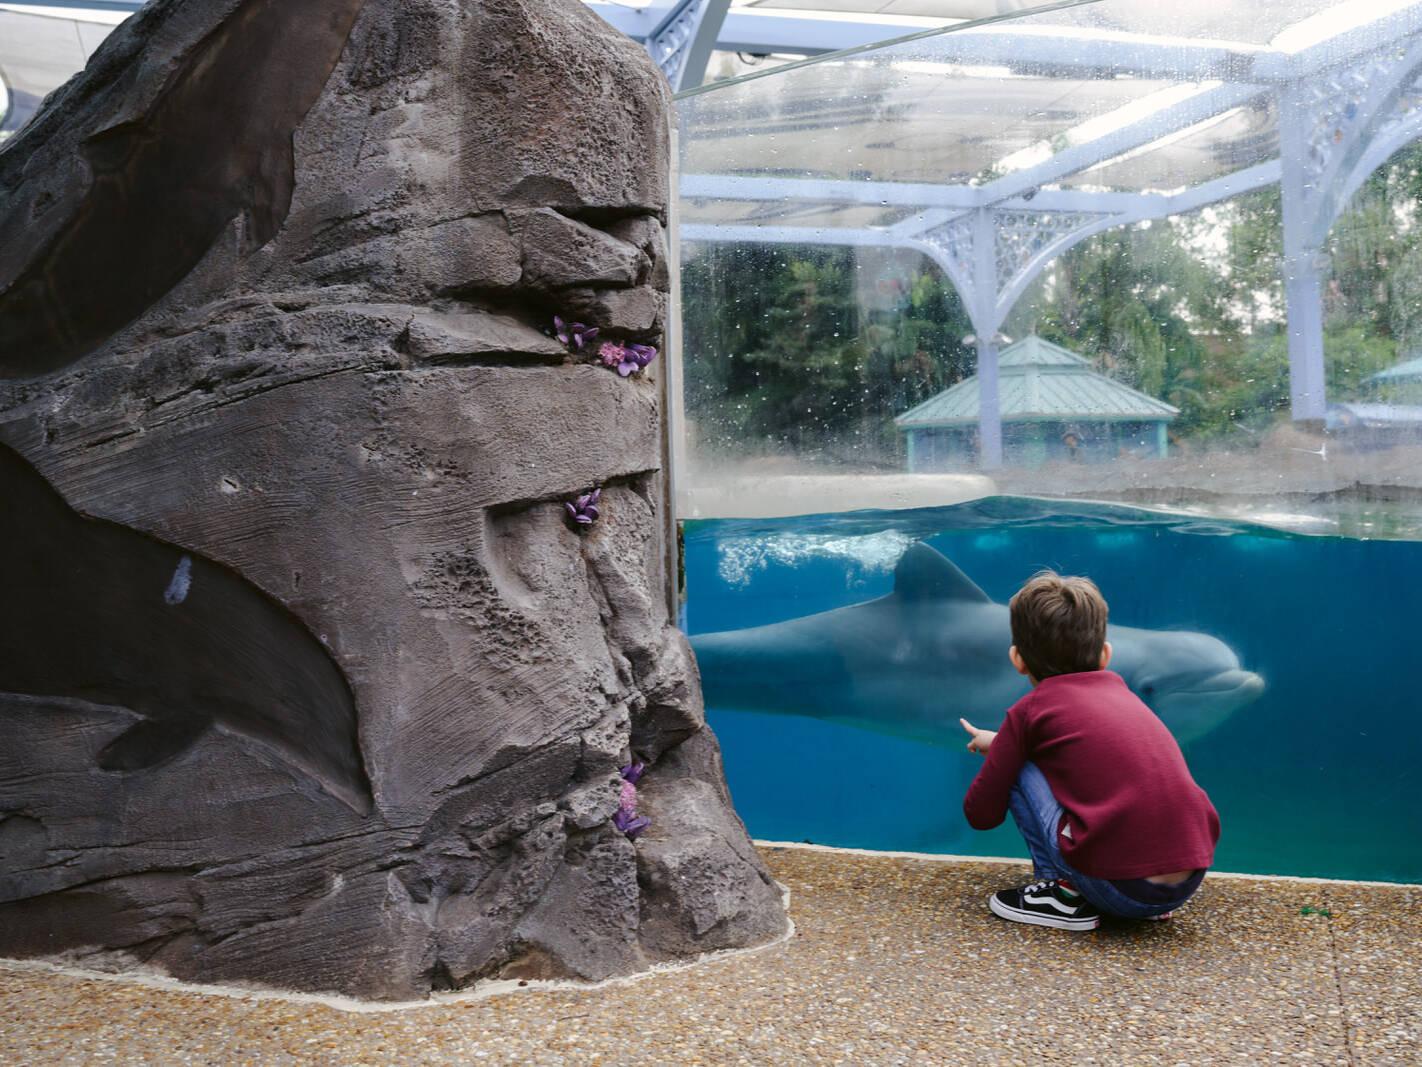 boy meets dolphin at SeaWorld